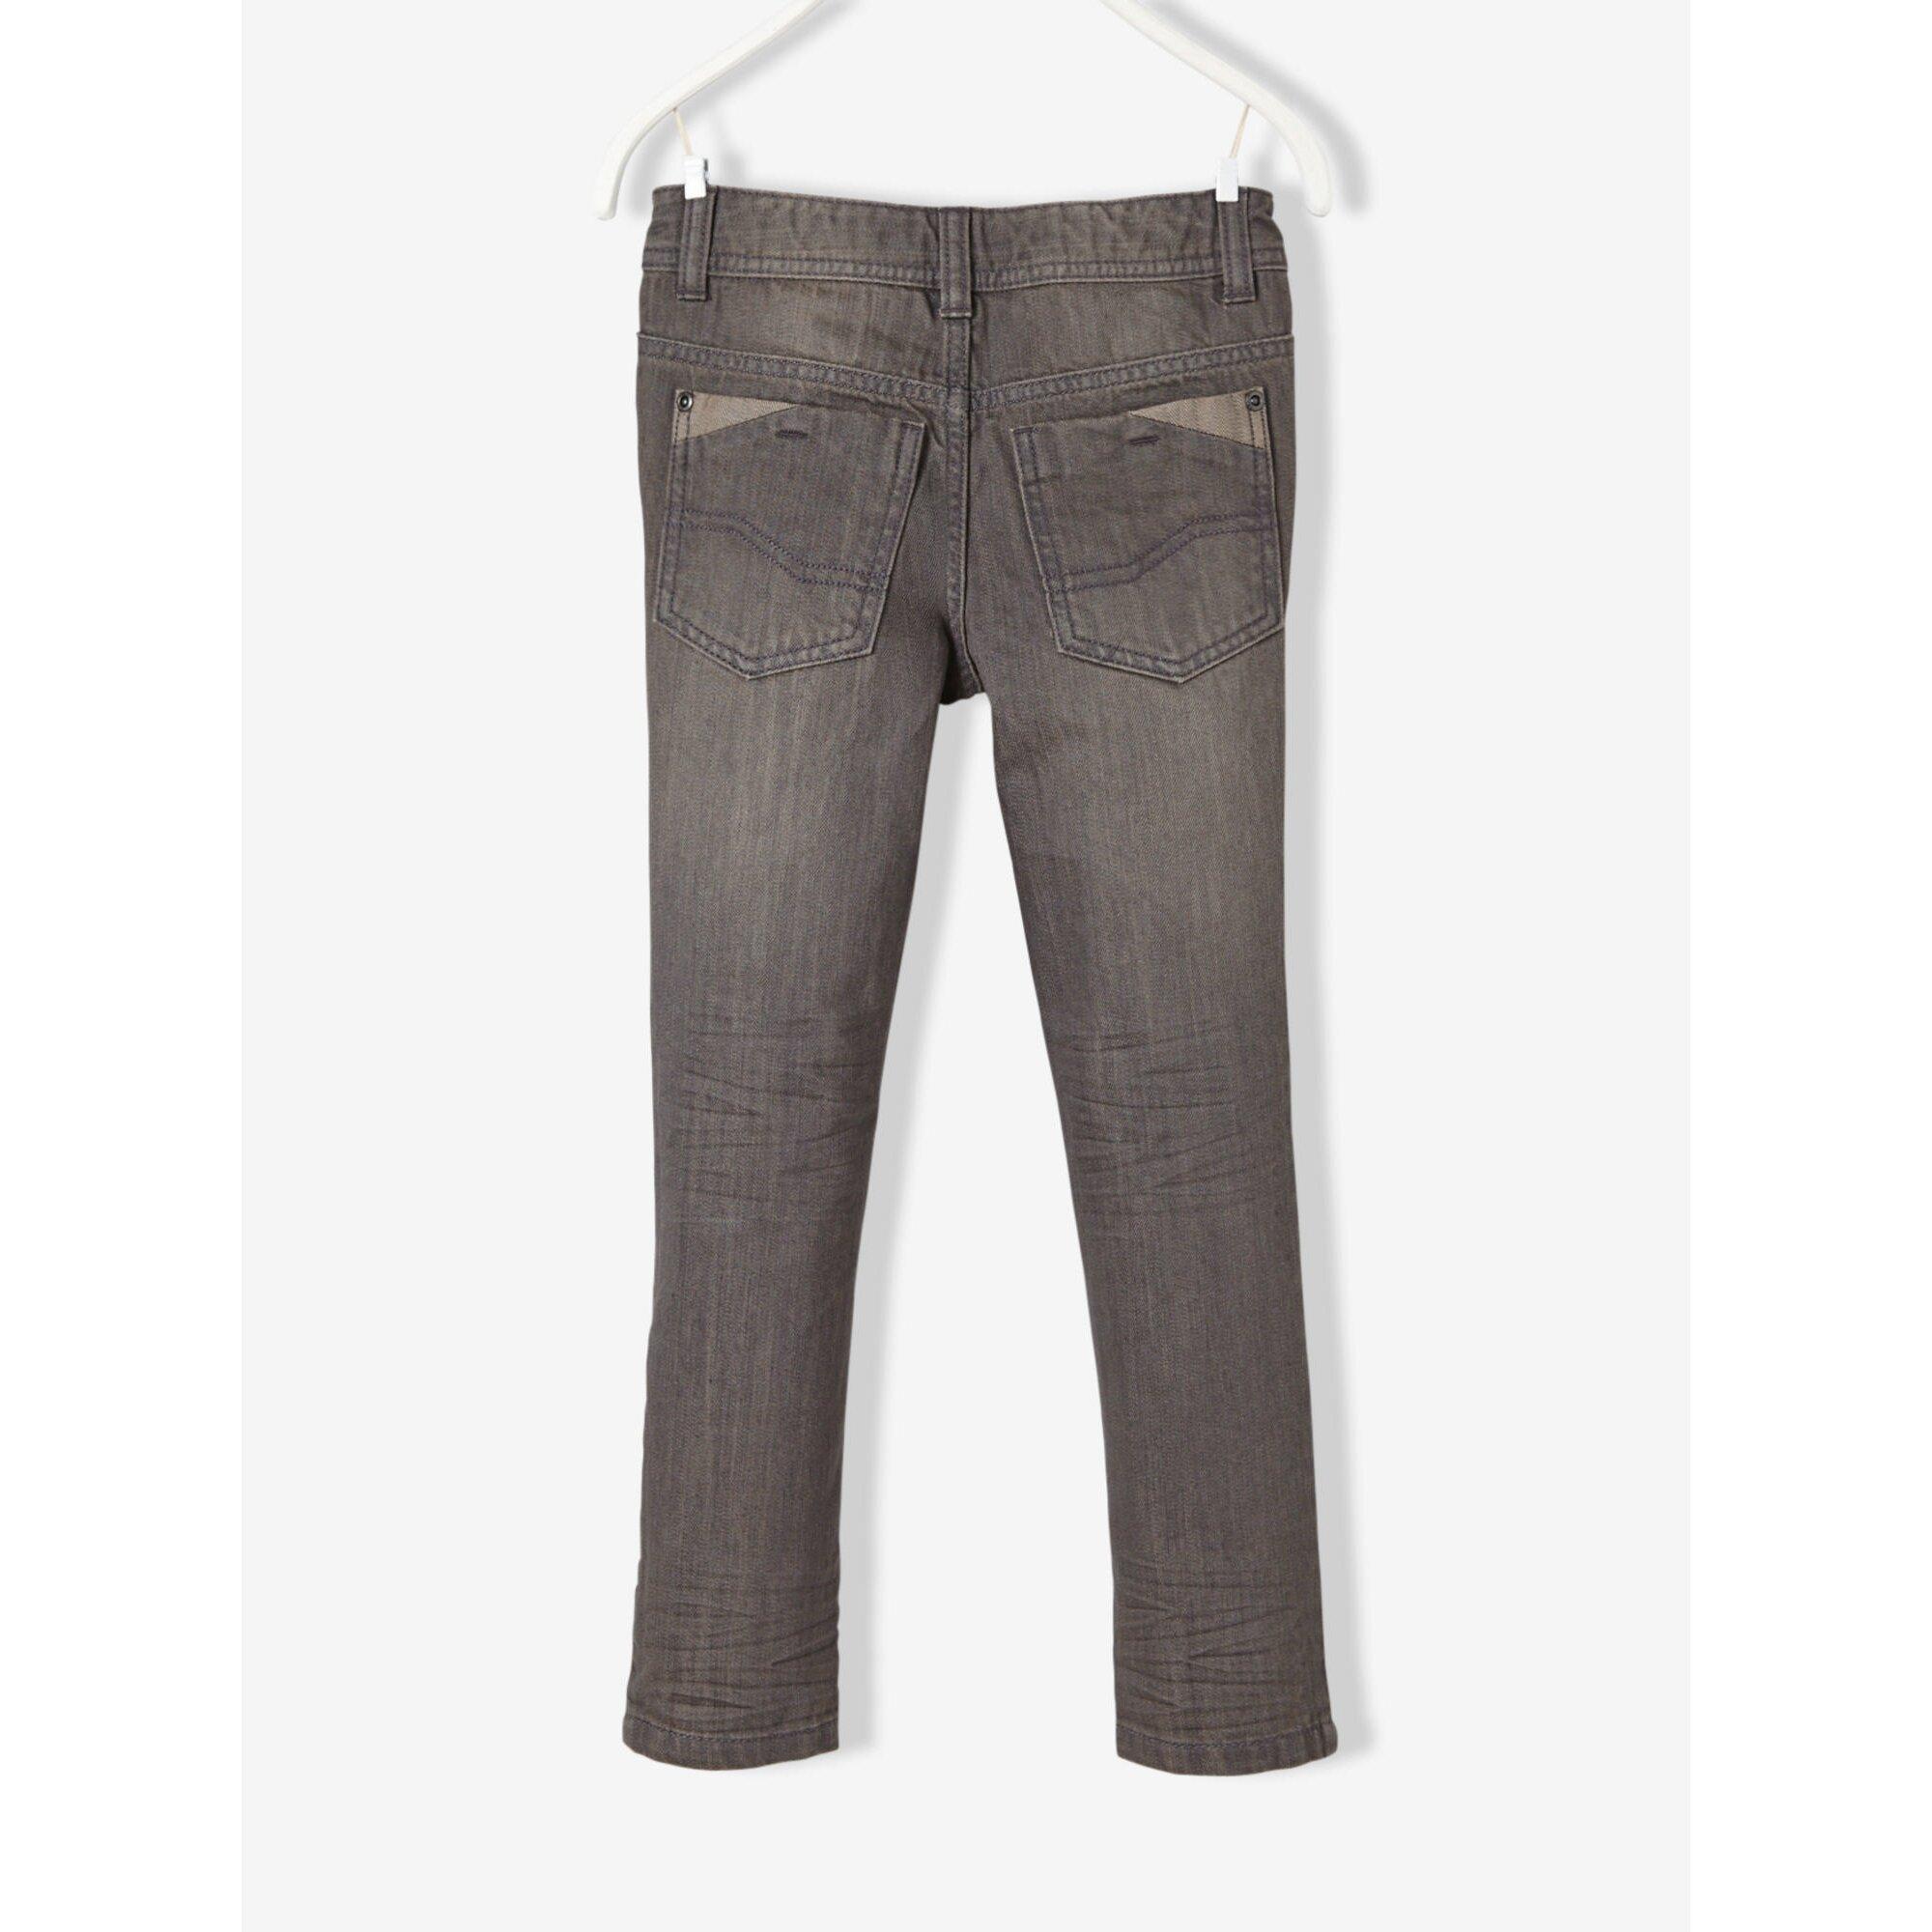 vertbaudet-gerade-jungen-jeans-huftweite-regular, 20.99 EUR @ babywalz-de